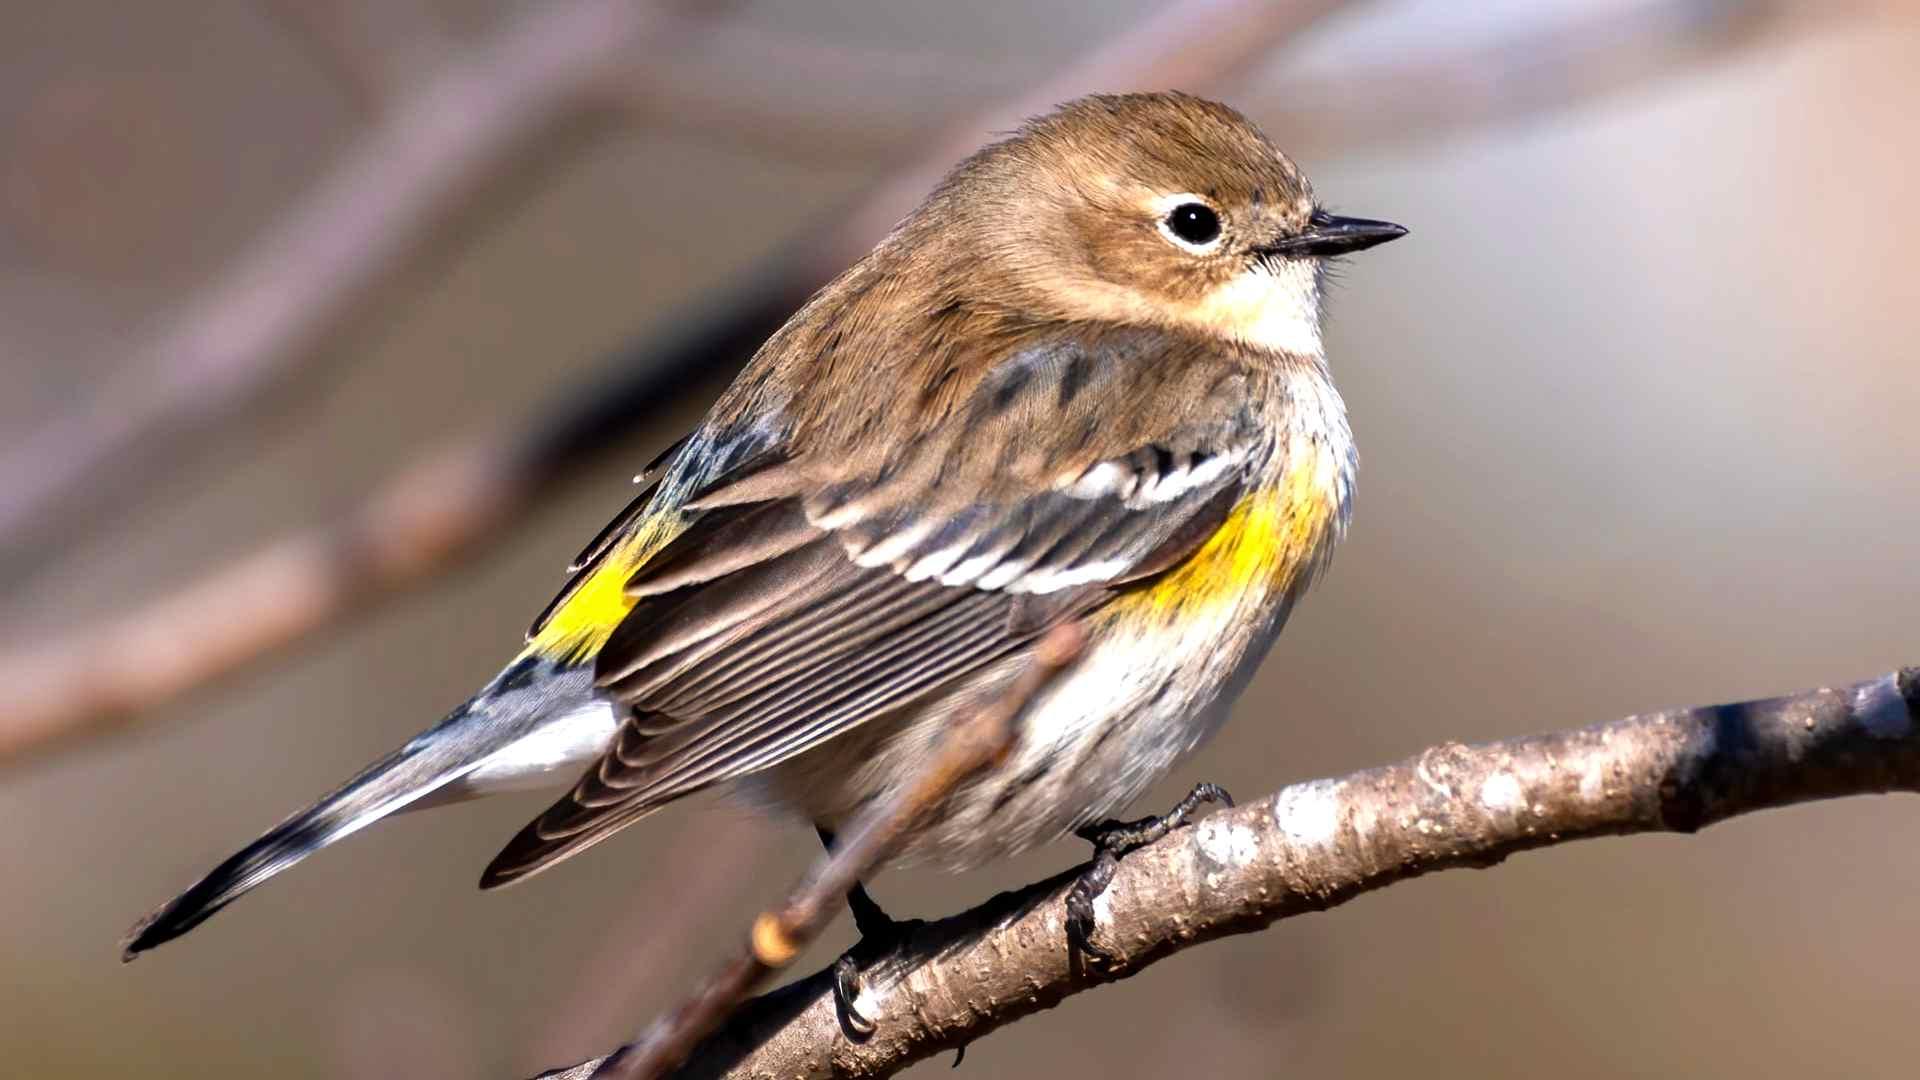 bird call identifier app - Yellow-rumped Warbler